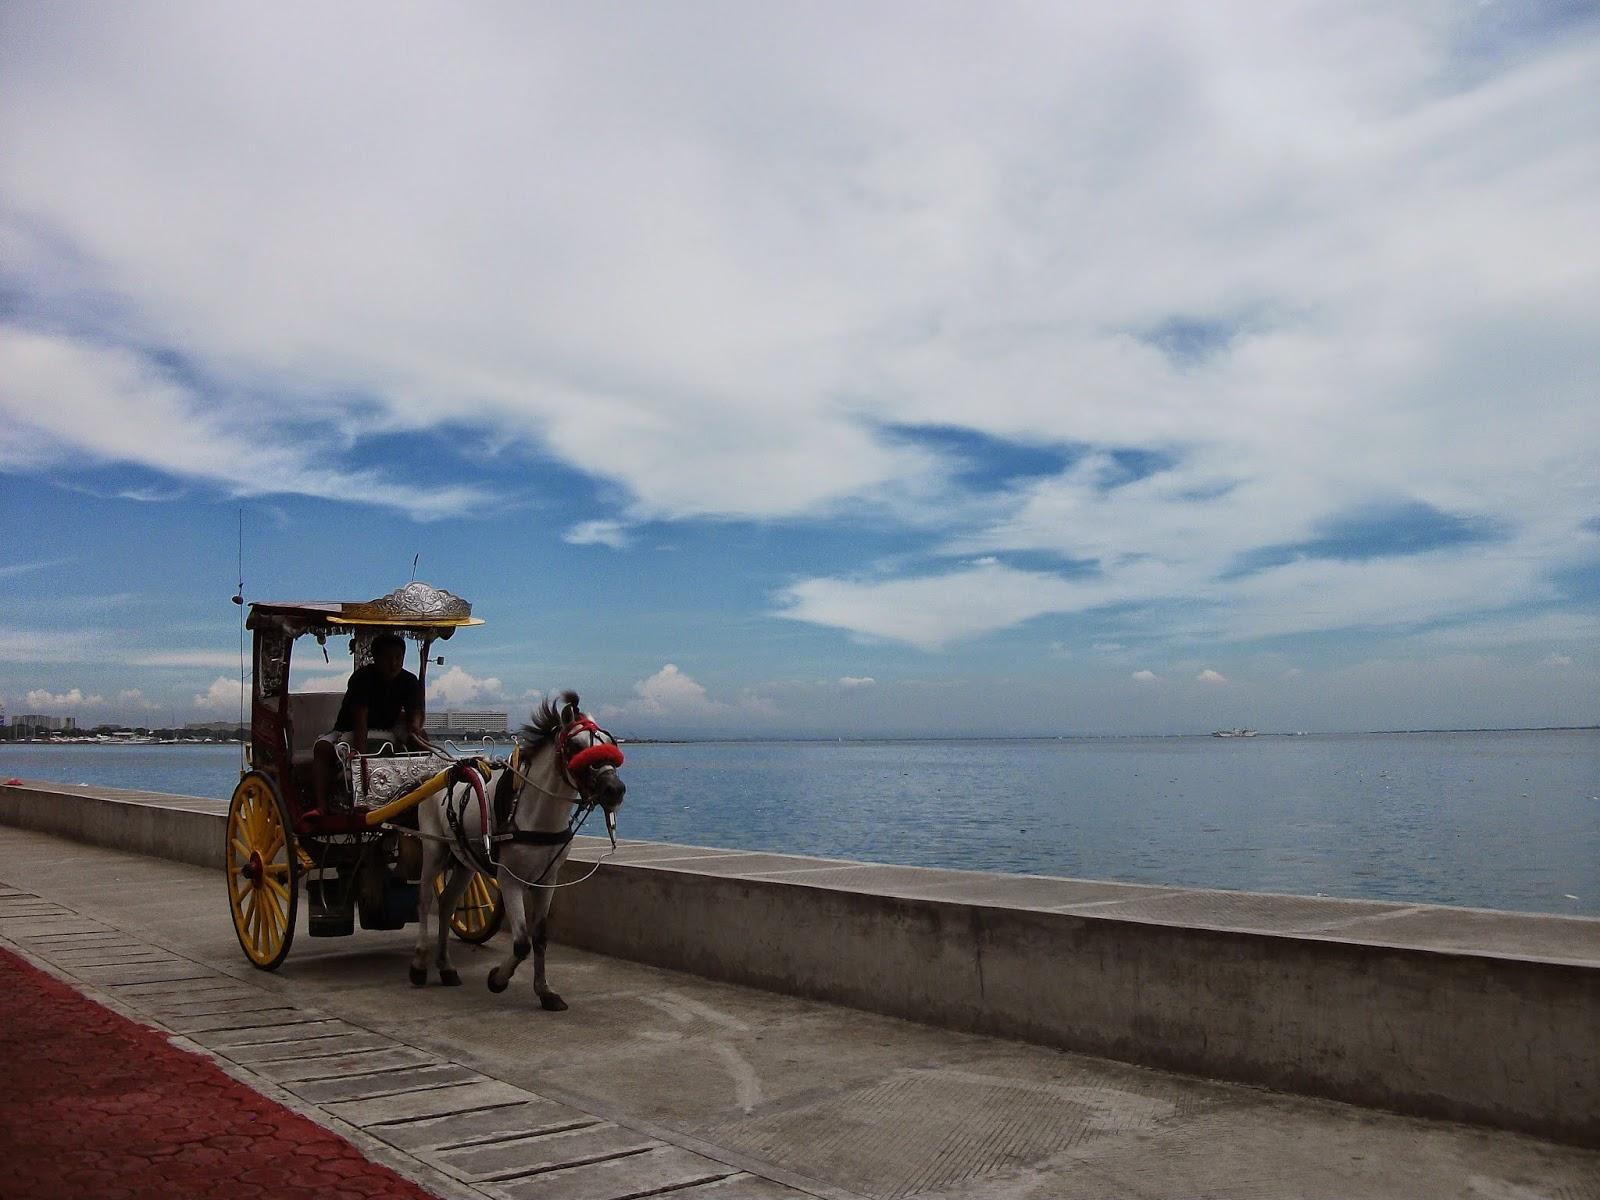 Mango Tours Diamond Hotel Philippines Manila Bay attraction